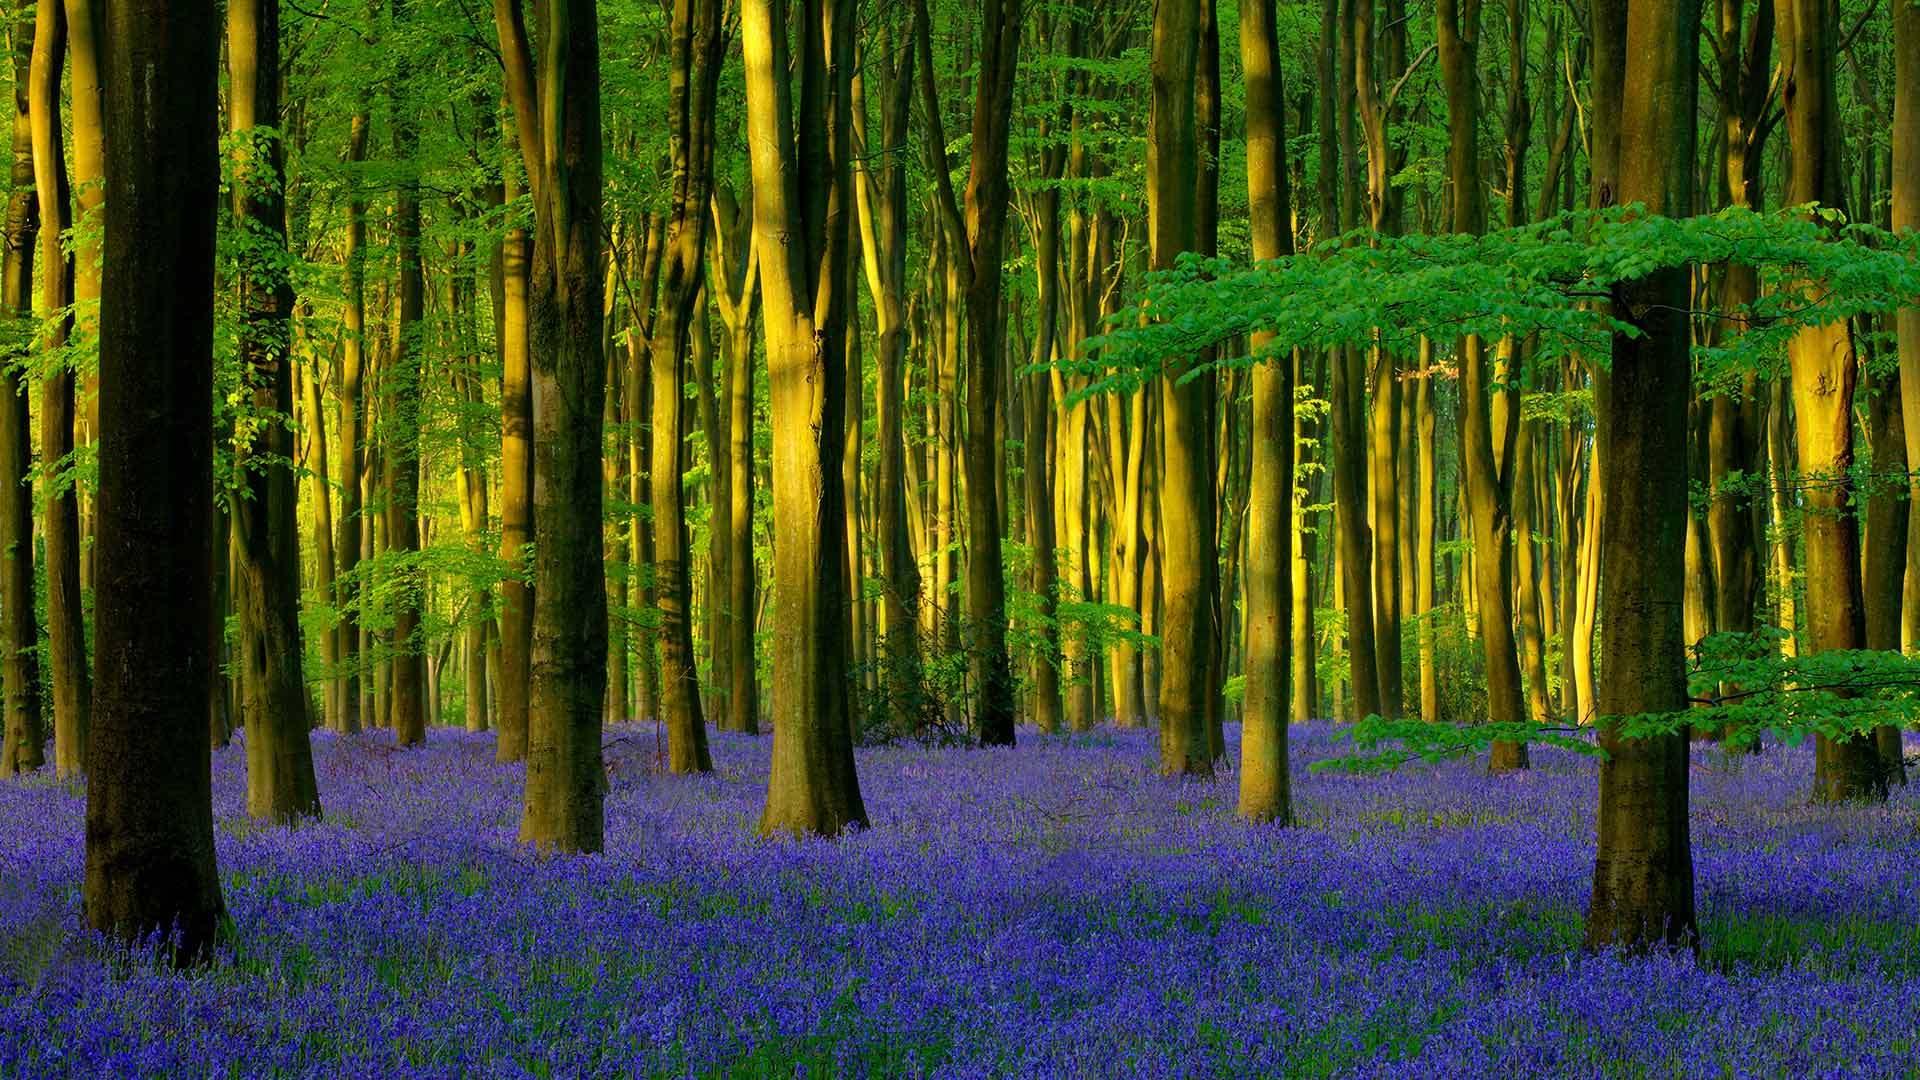 Micheldever Wood的蓝铃花蓝铃花